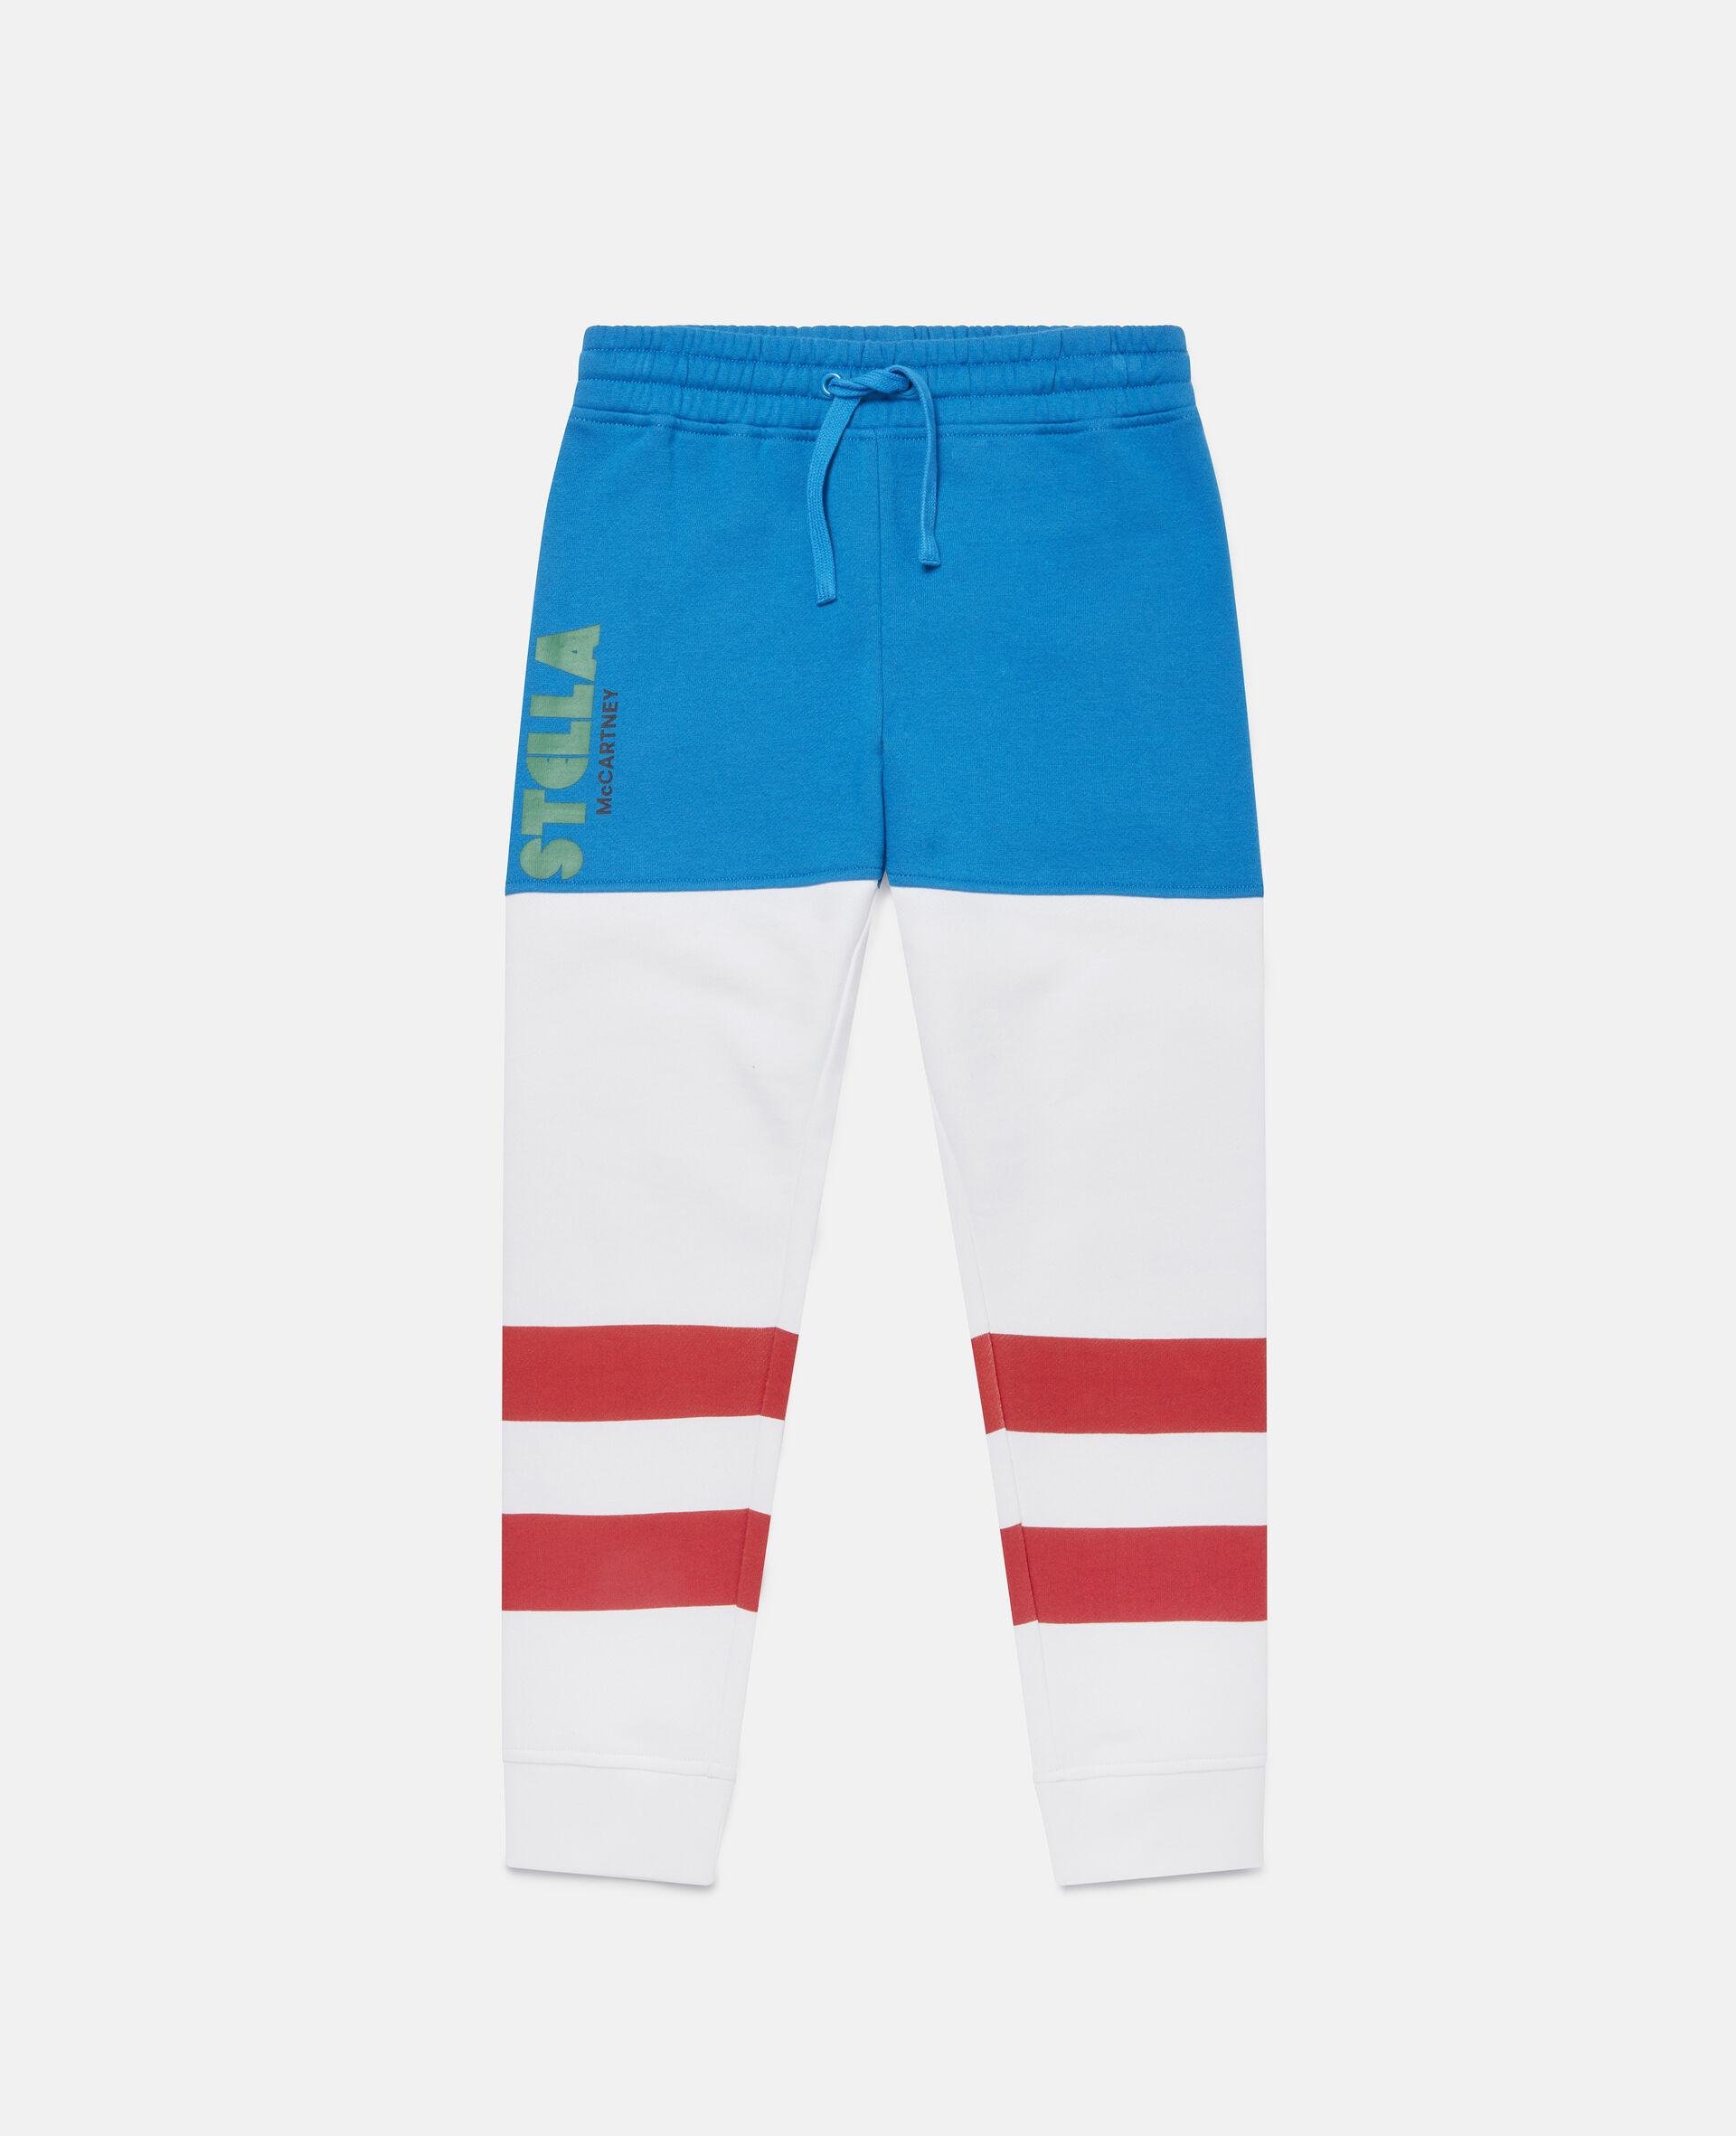 Pantaloni Sportivi a Blocchi di Colore-Fantasia-large image number 0